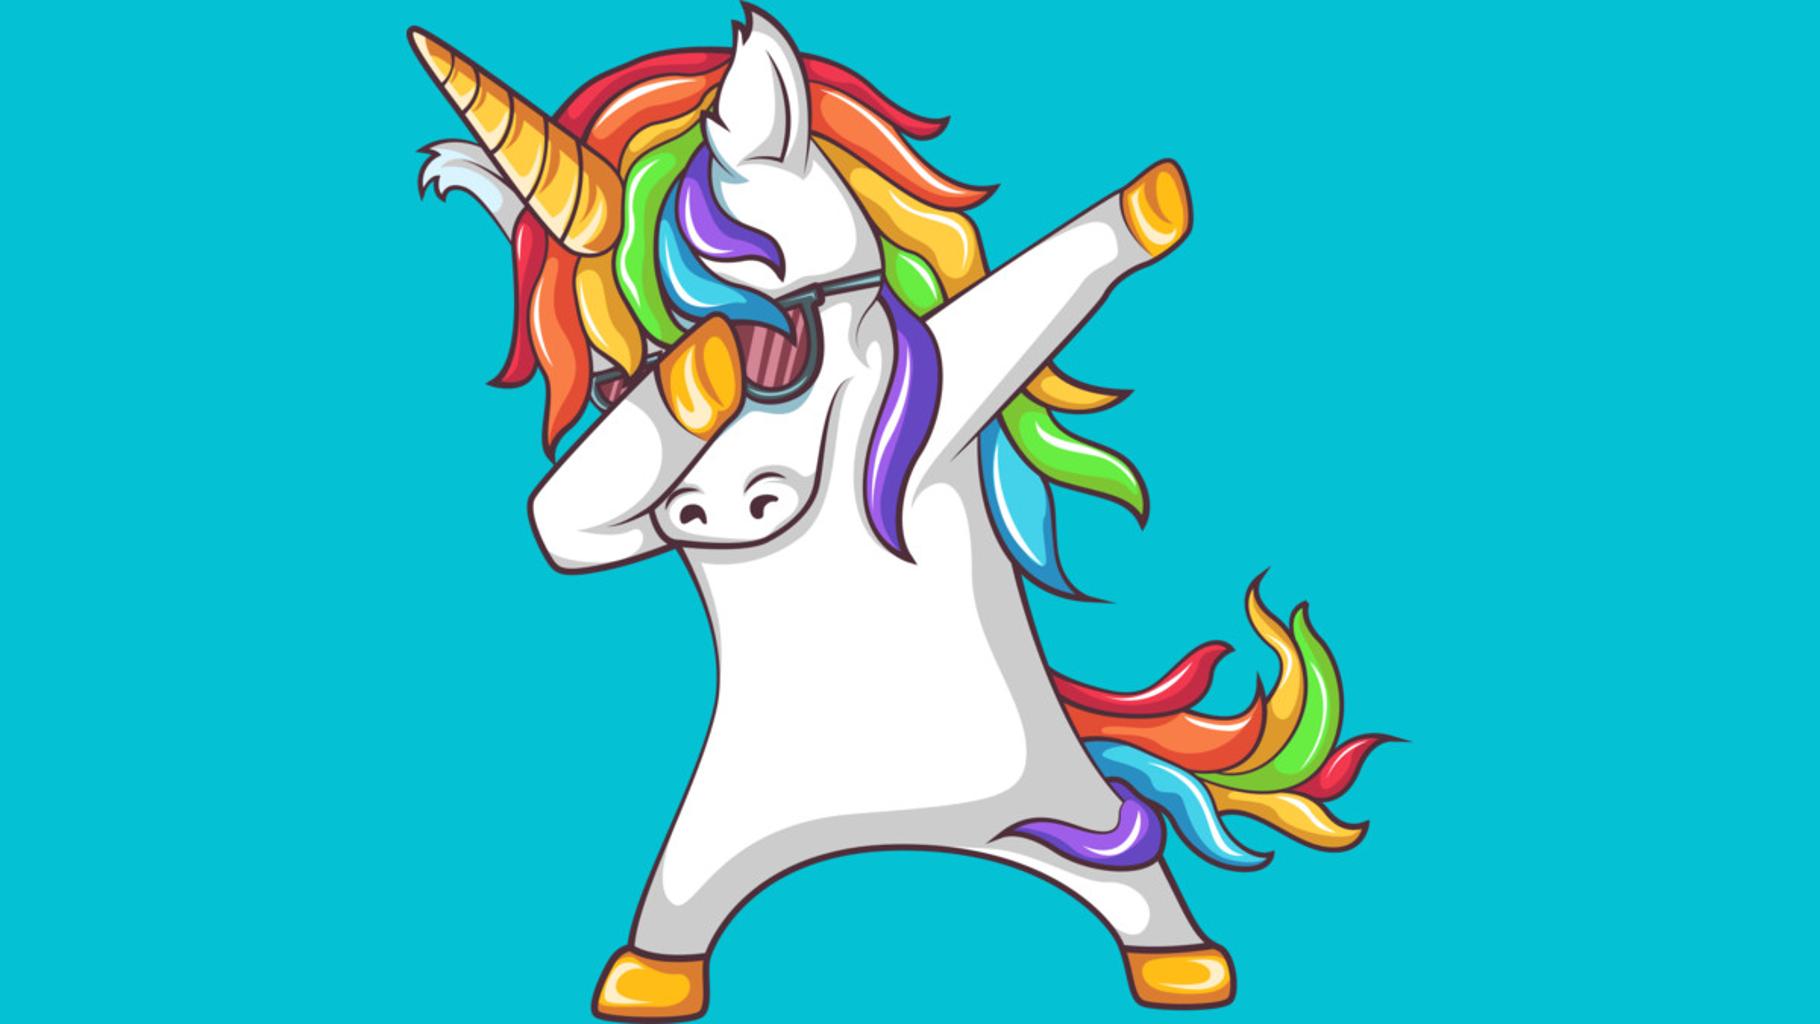 Design by Humans: Dabbing Unicorn